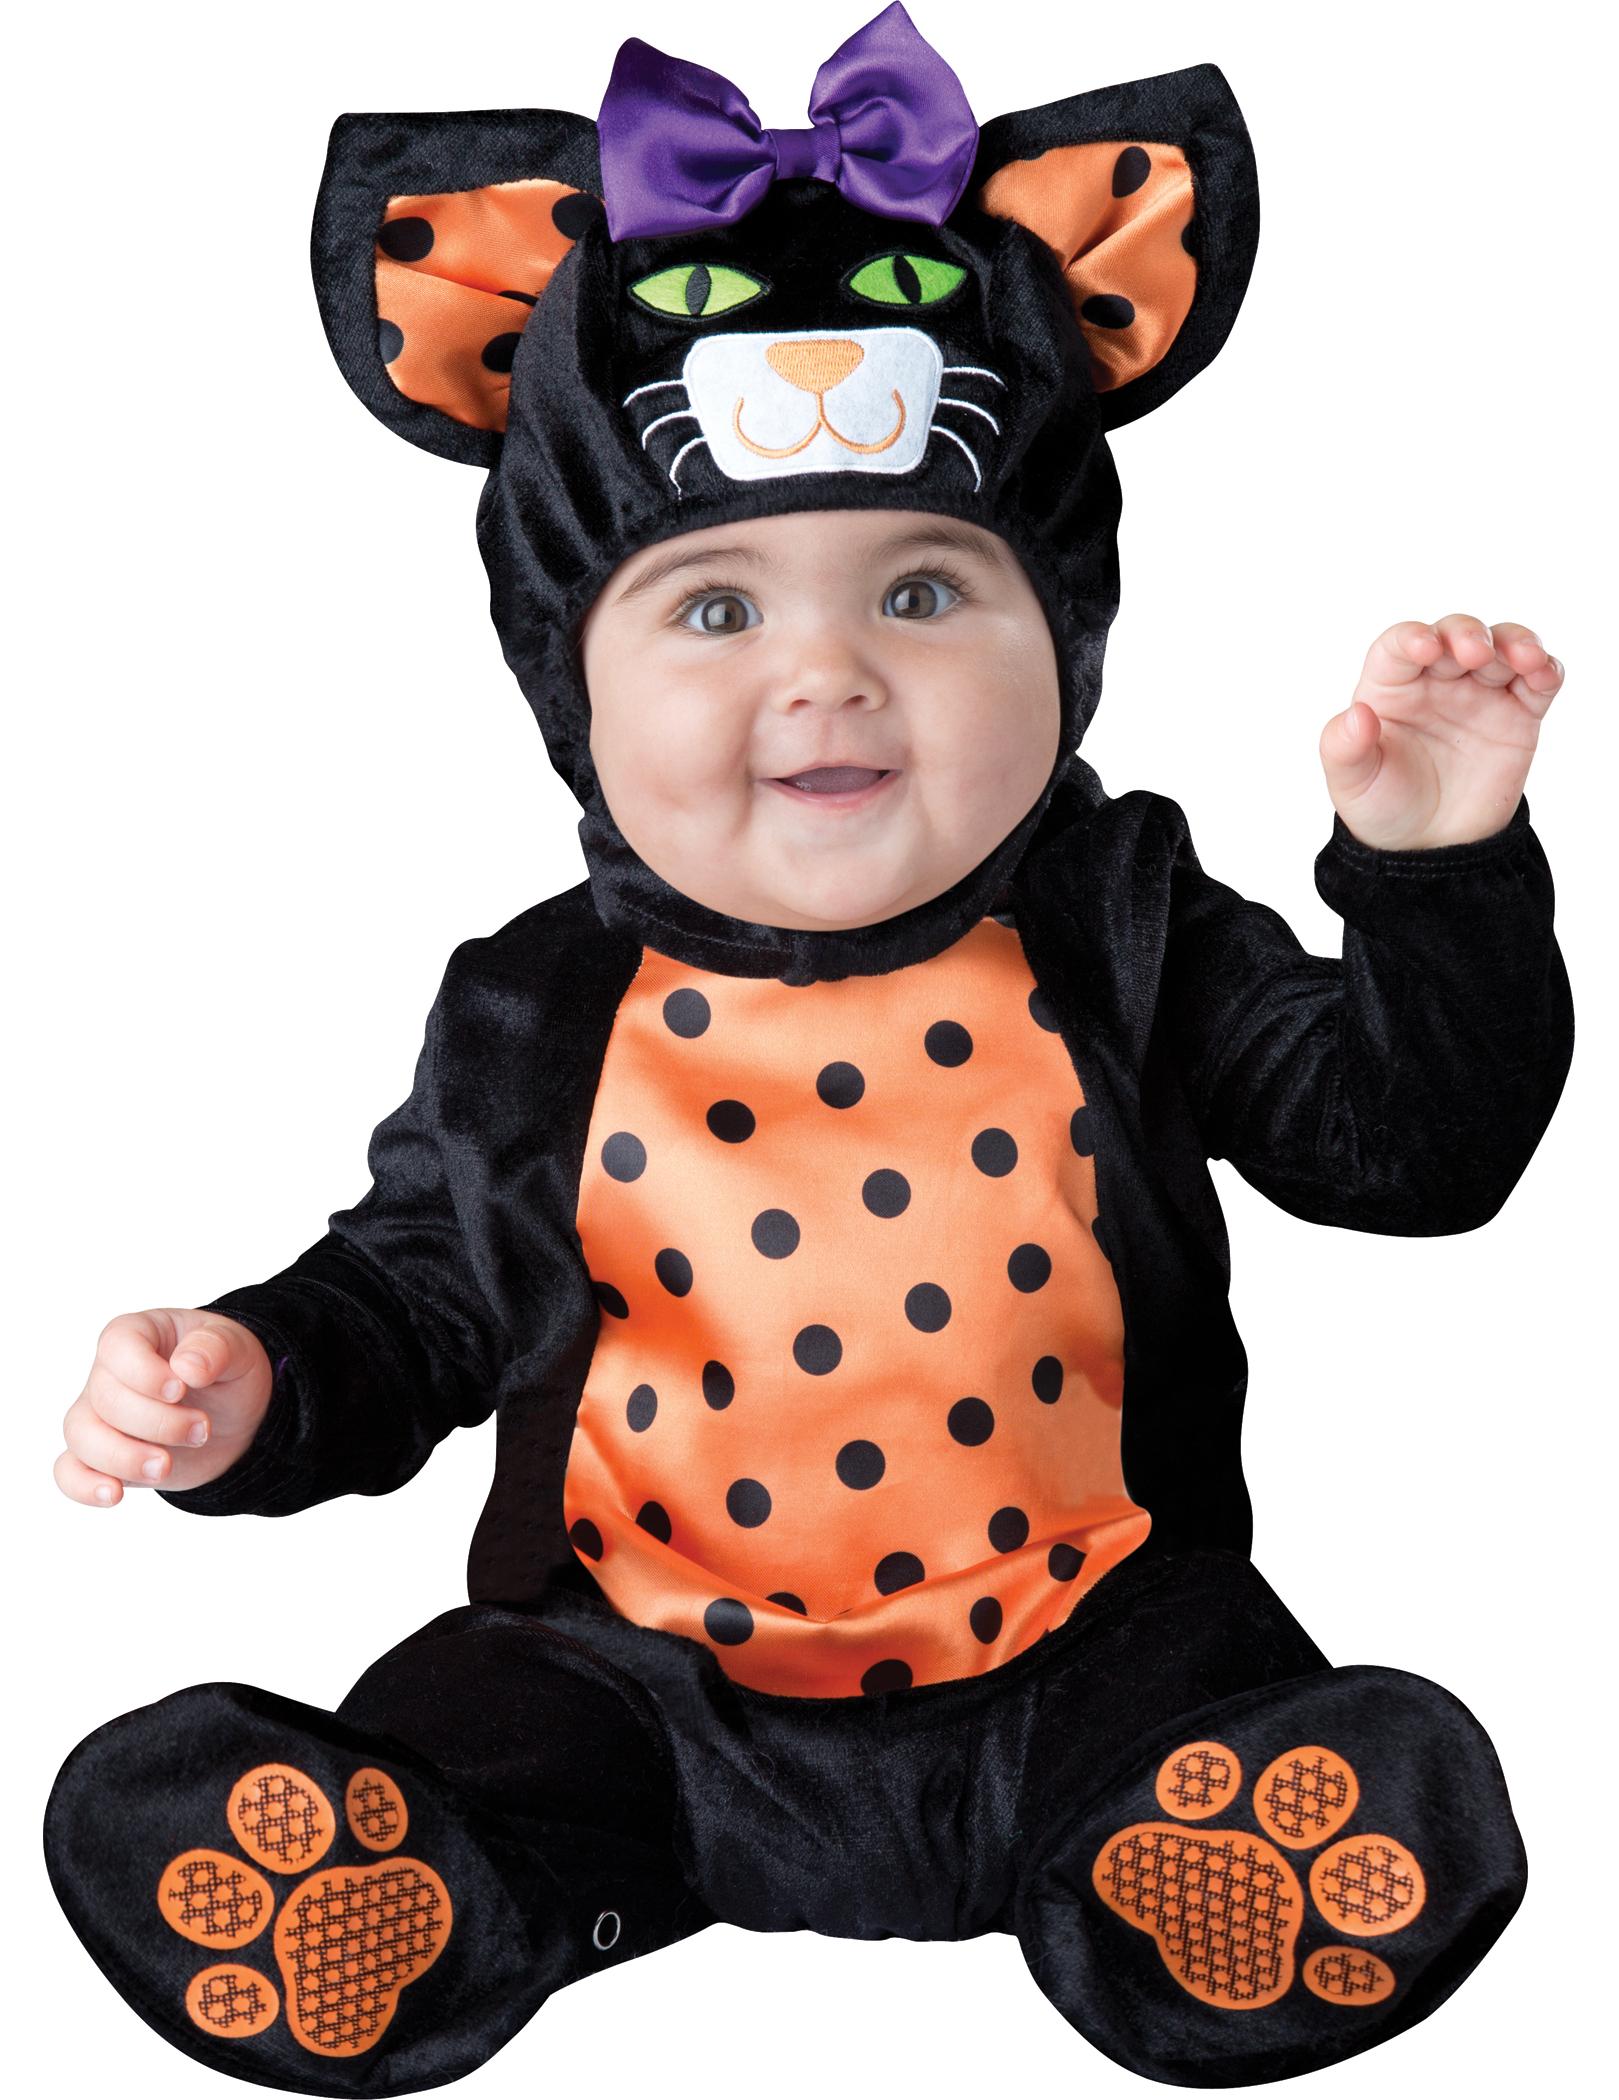 deguisement halloween bebe 9 mois